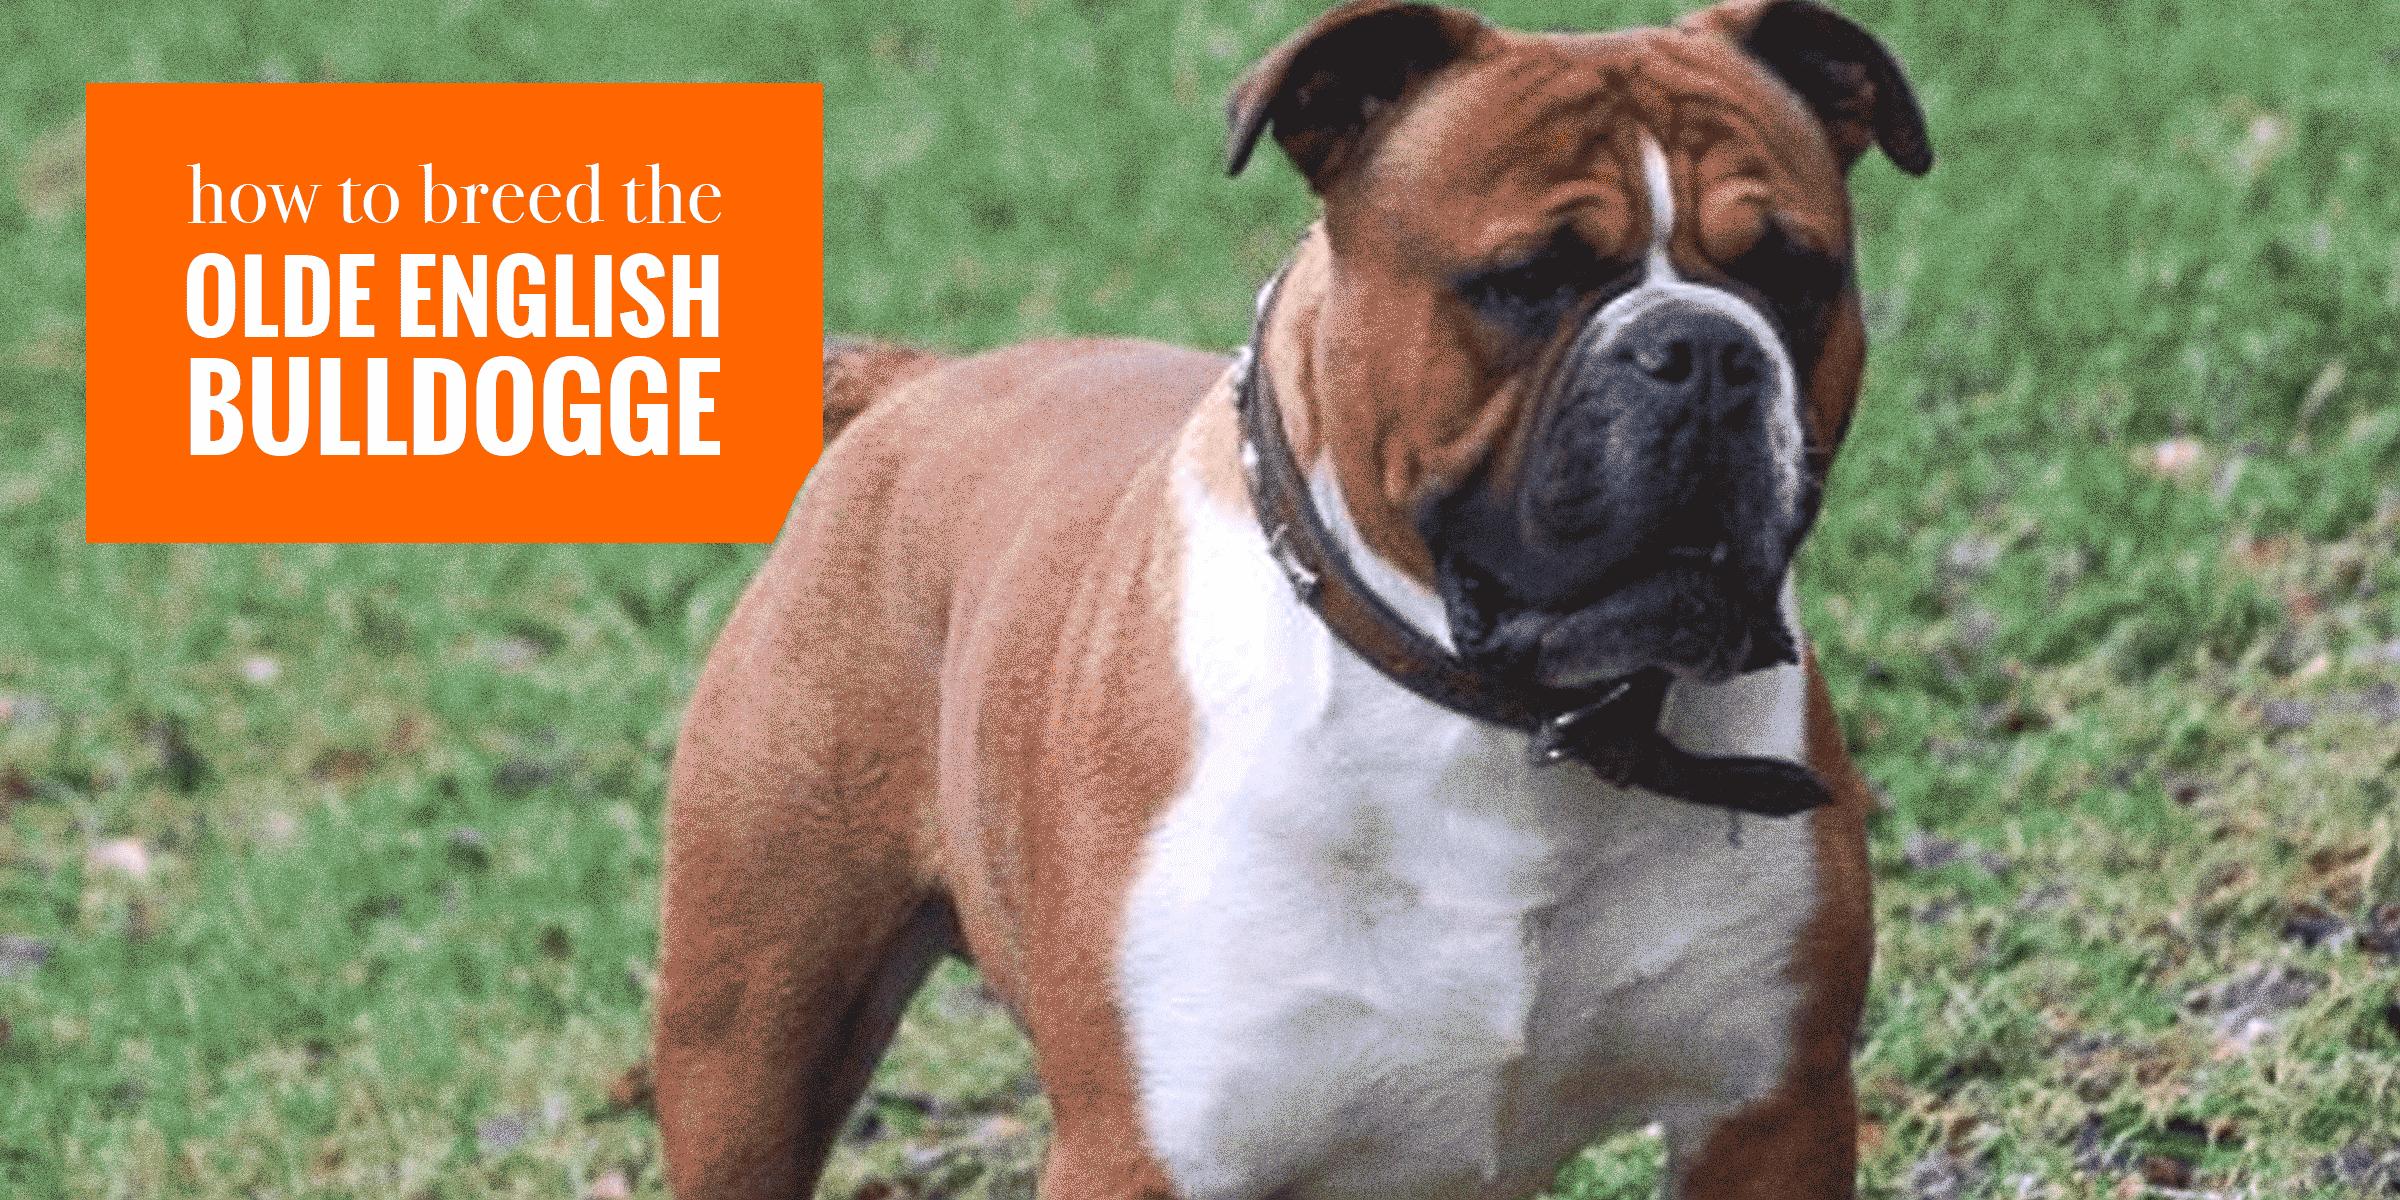 Breeding Olde English Bulldogge Dogs — Health, Litter Management...